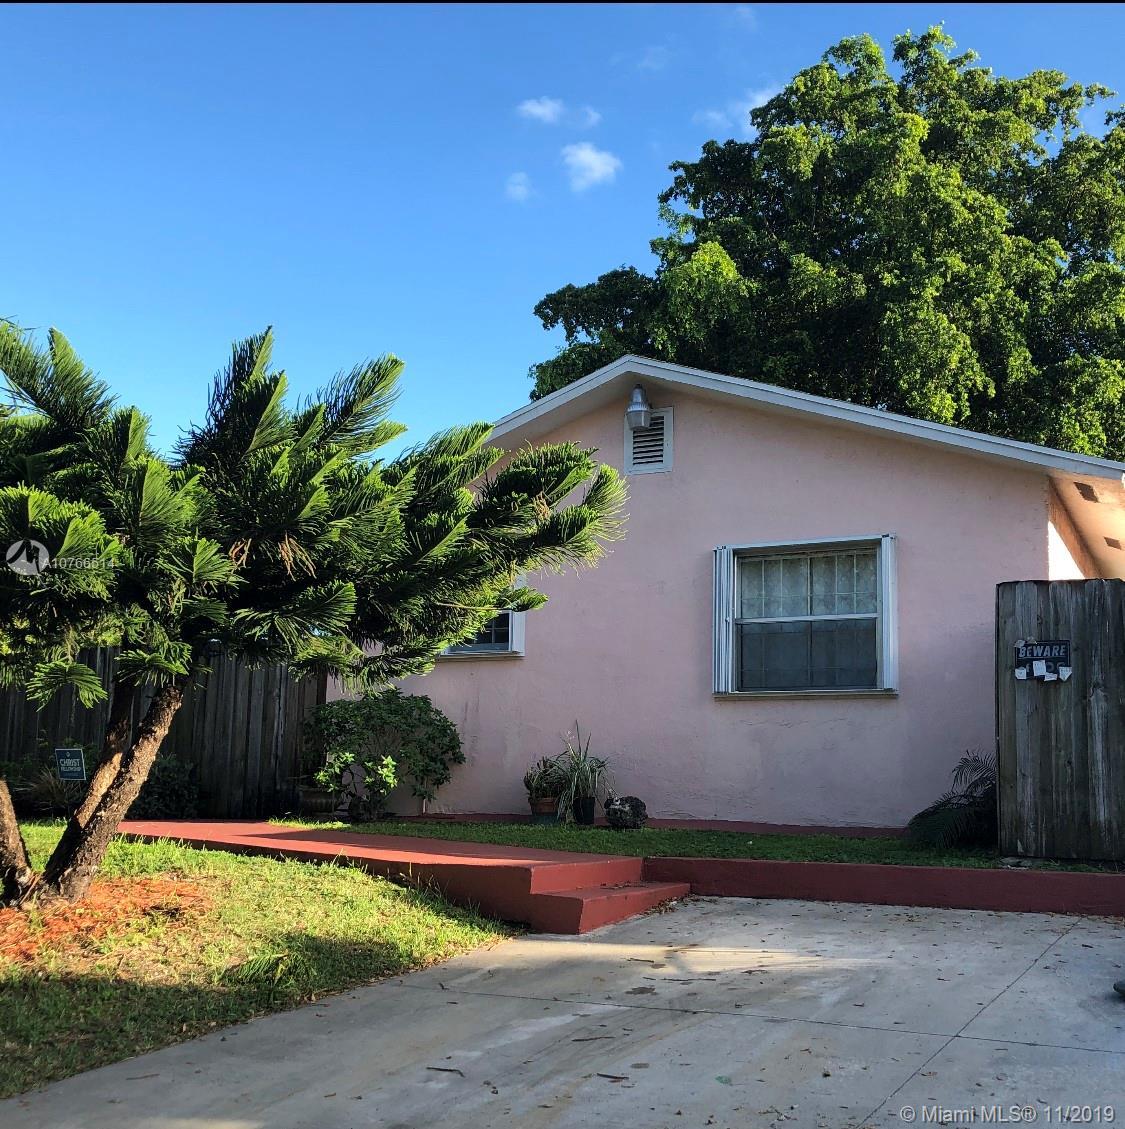 13628 SW 284th Ter, Homestead, FL 33033 - Homestead, FL real estate listing